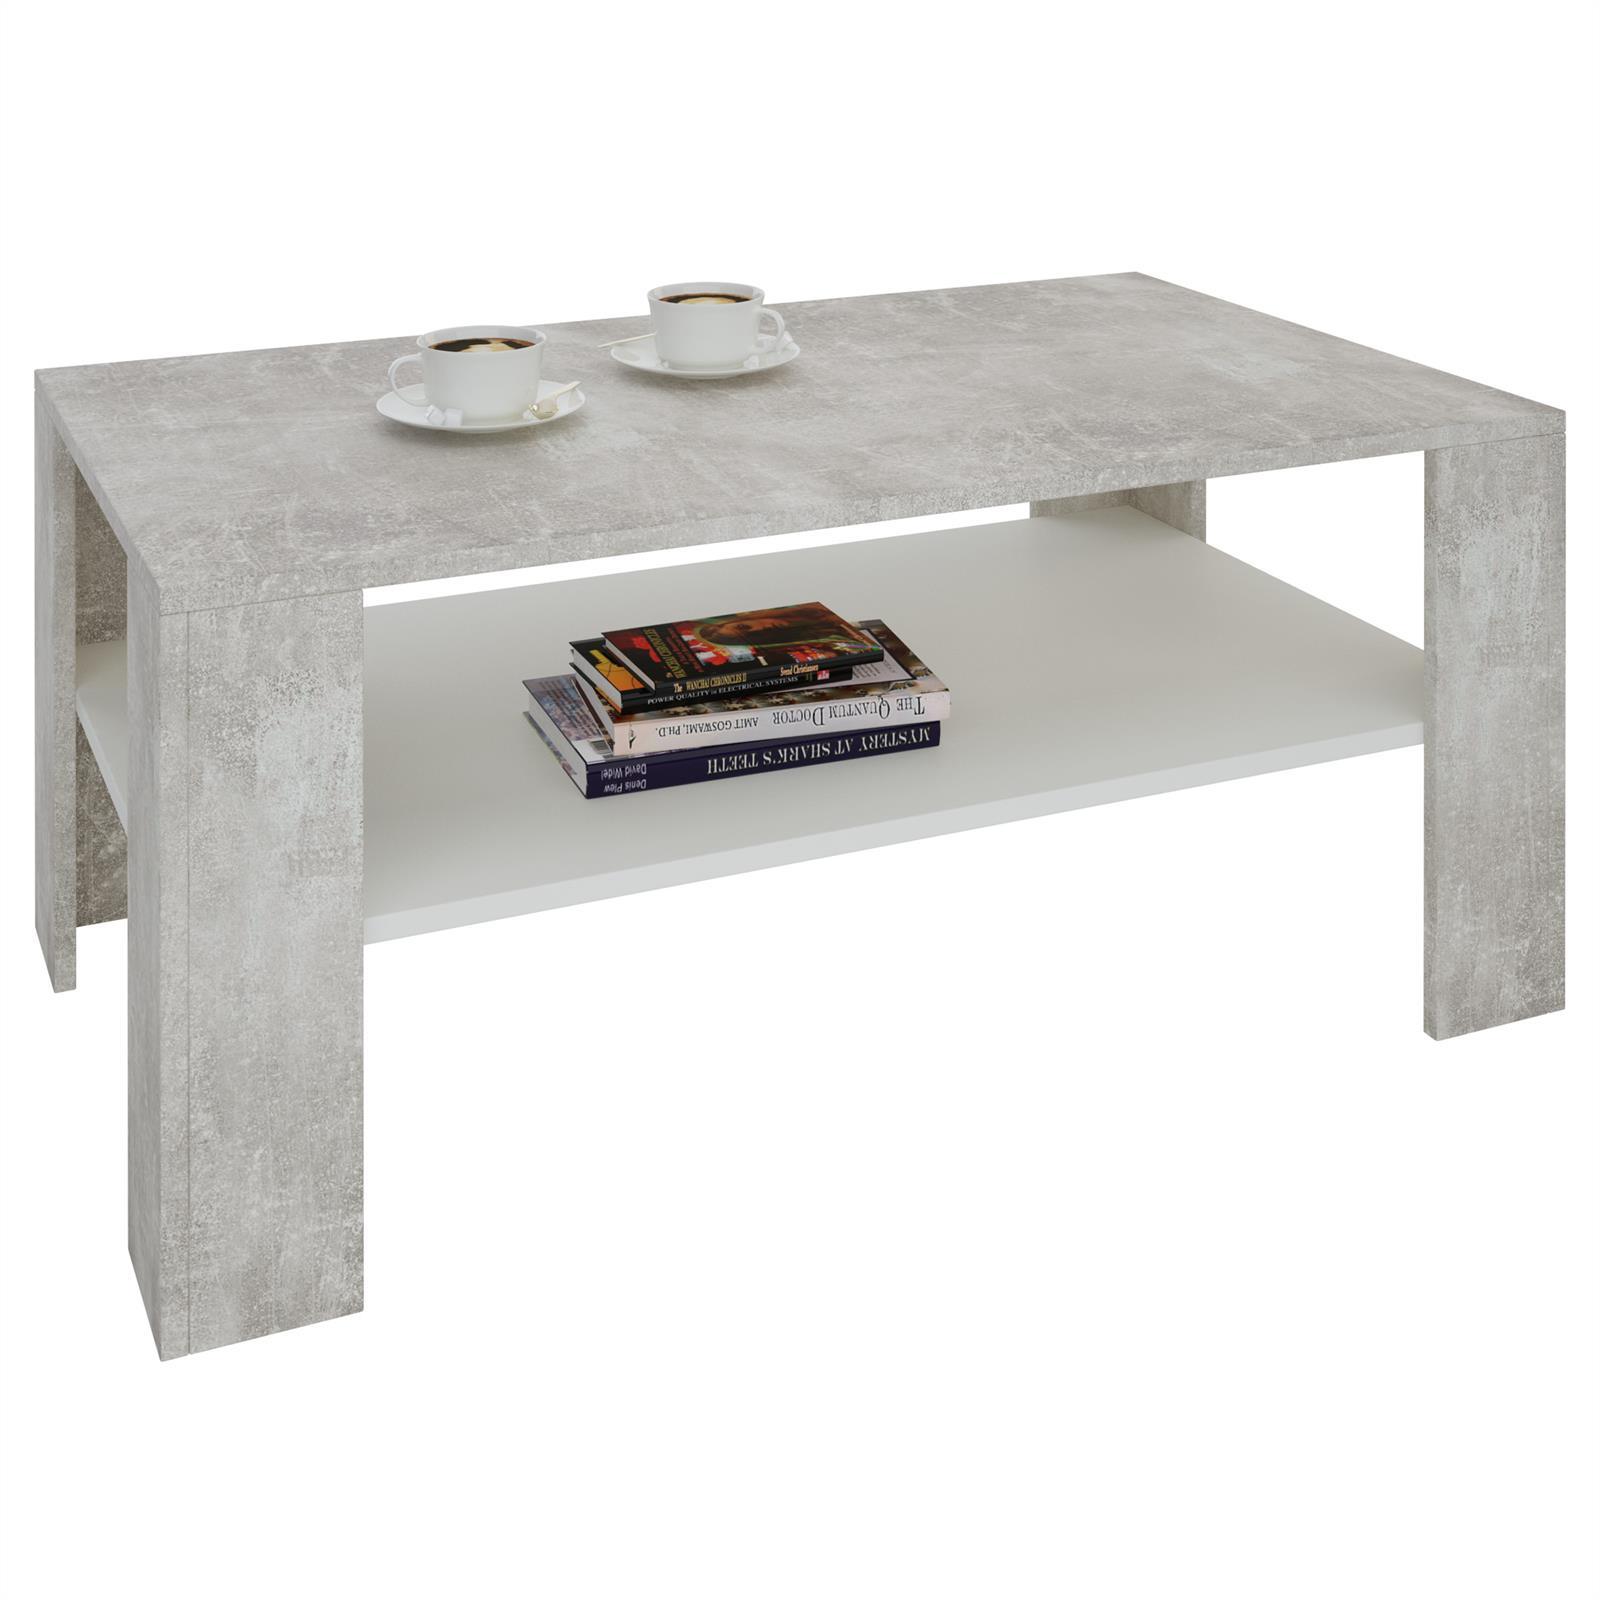 couchtisch animo in betonoptik wei 100 cm breit caro m bel. Black Bedroom Furniture Sets. Home Design Ideas